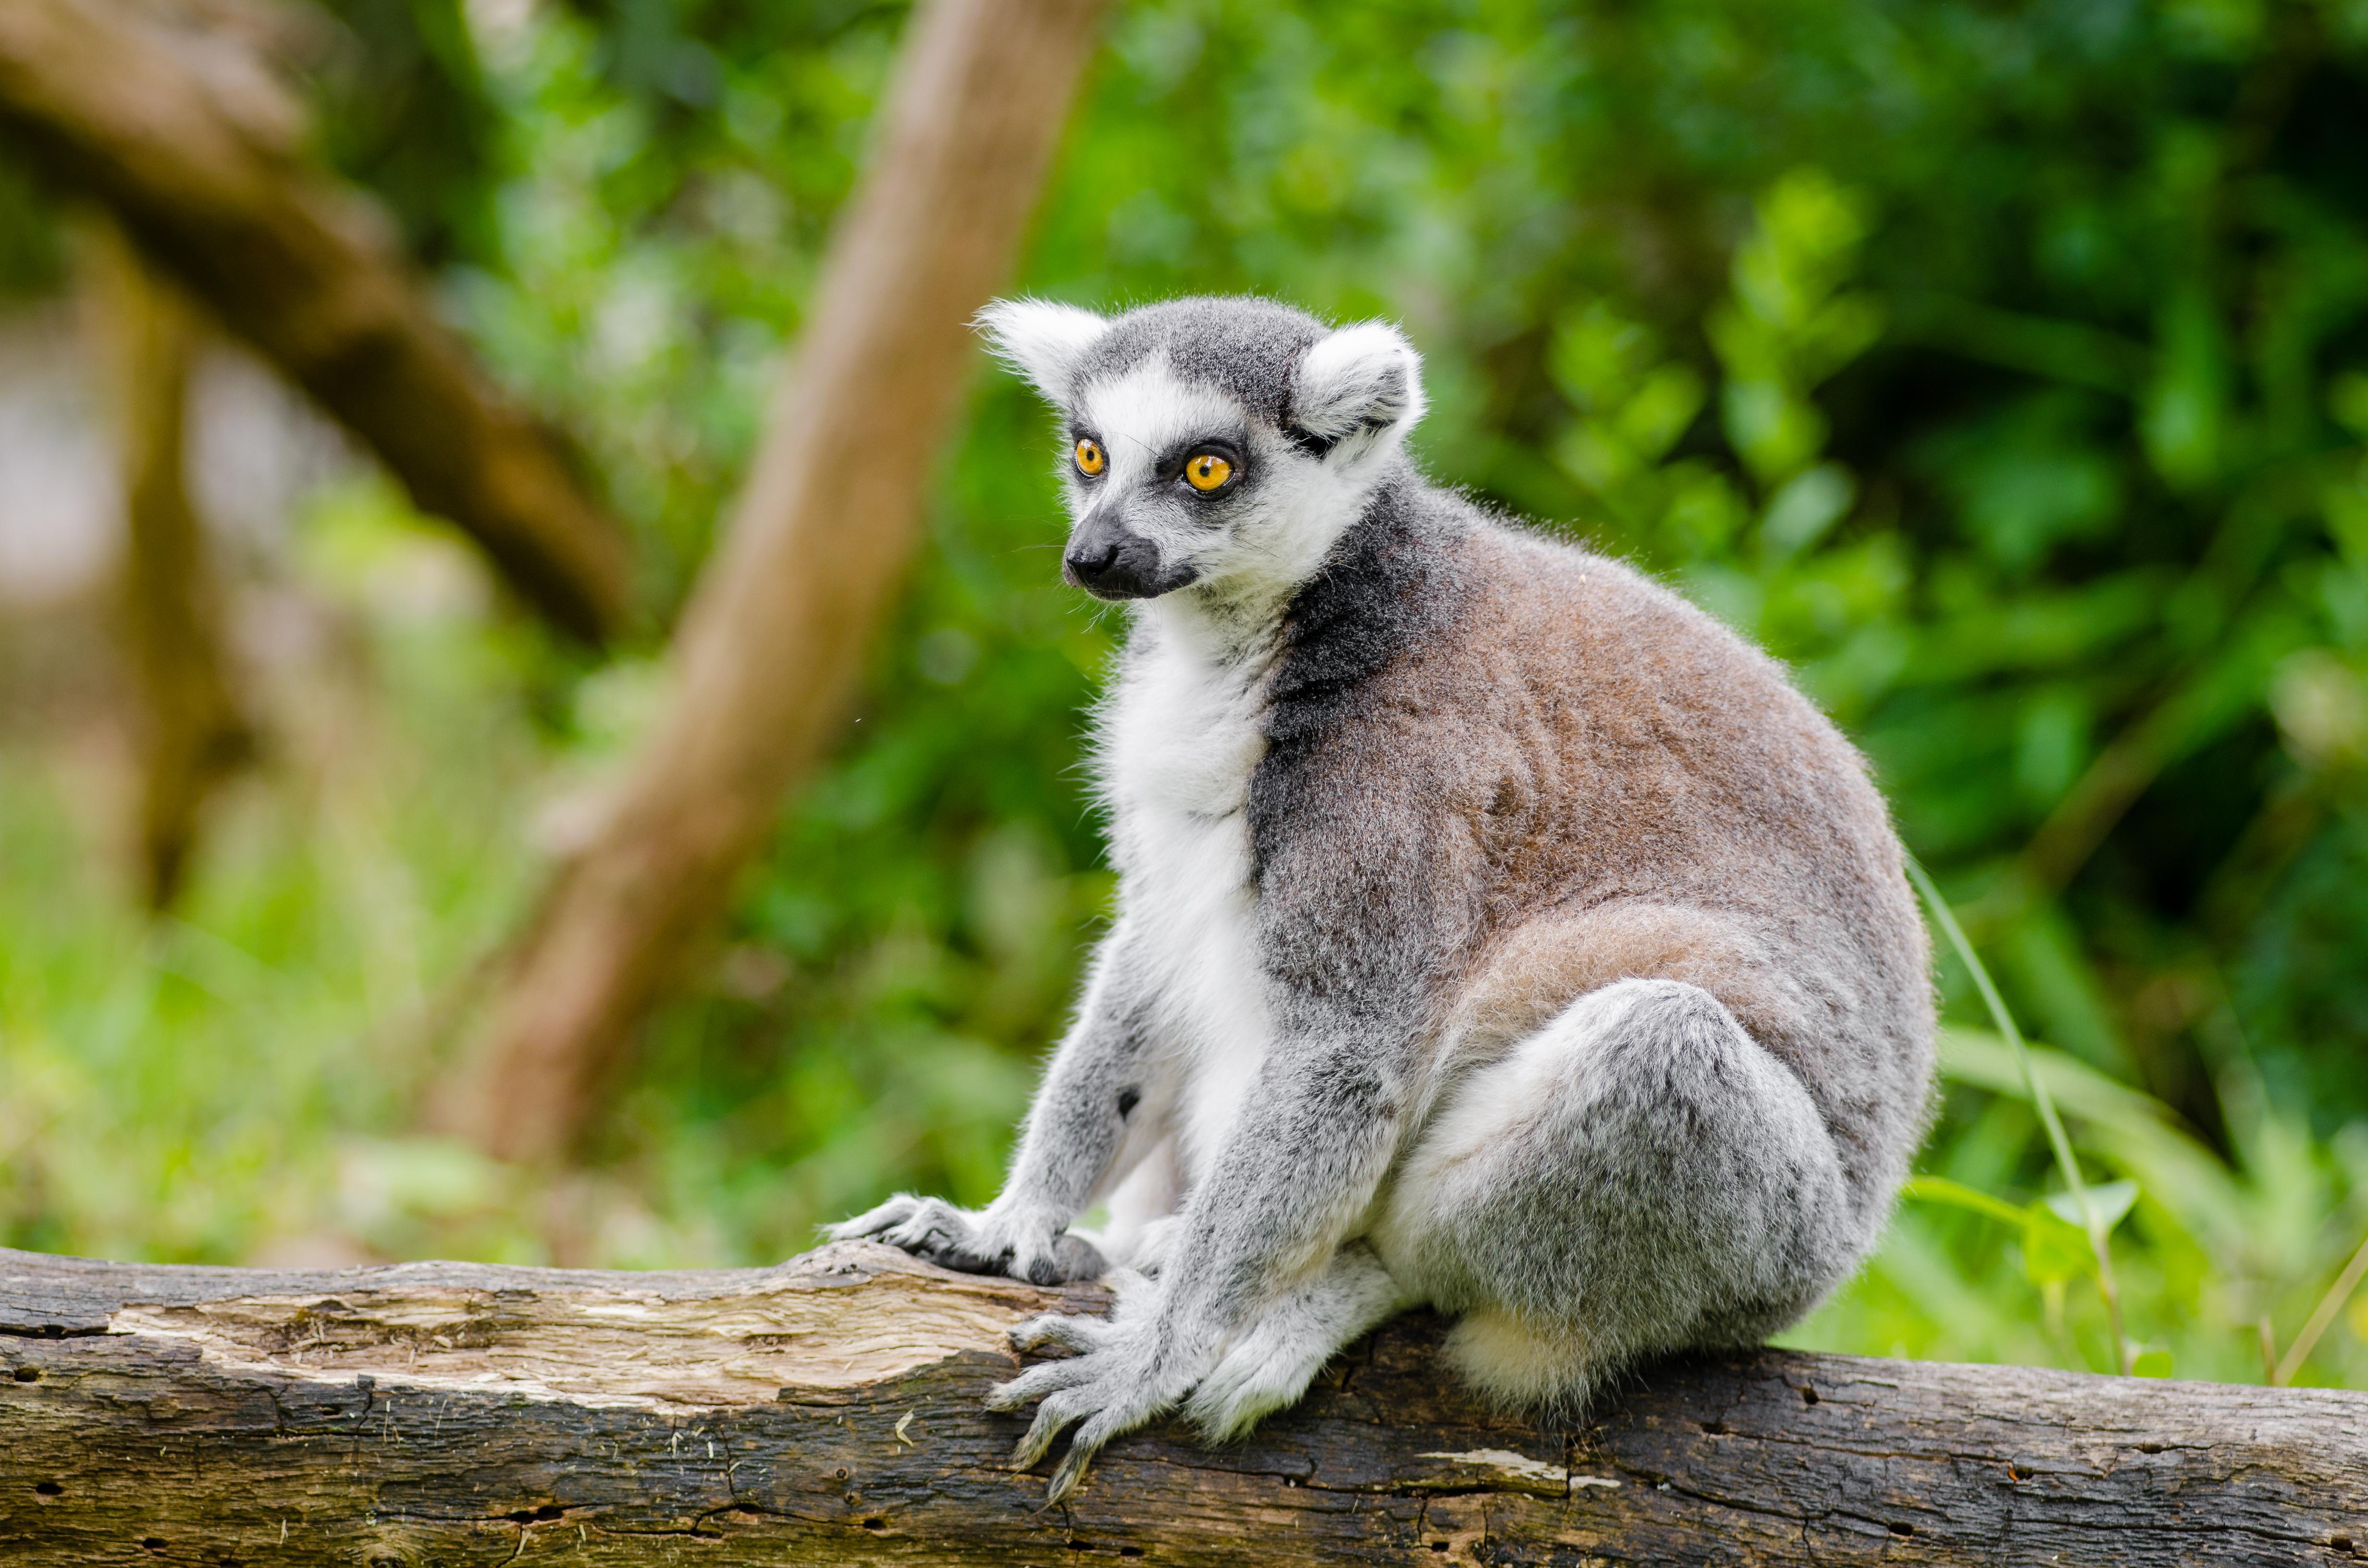 Duisburg 20160705 MAP_0768, Animal, Depth of field, Lemur, Madagascar, HQ Photo